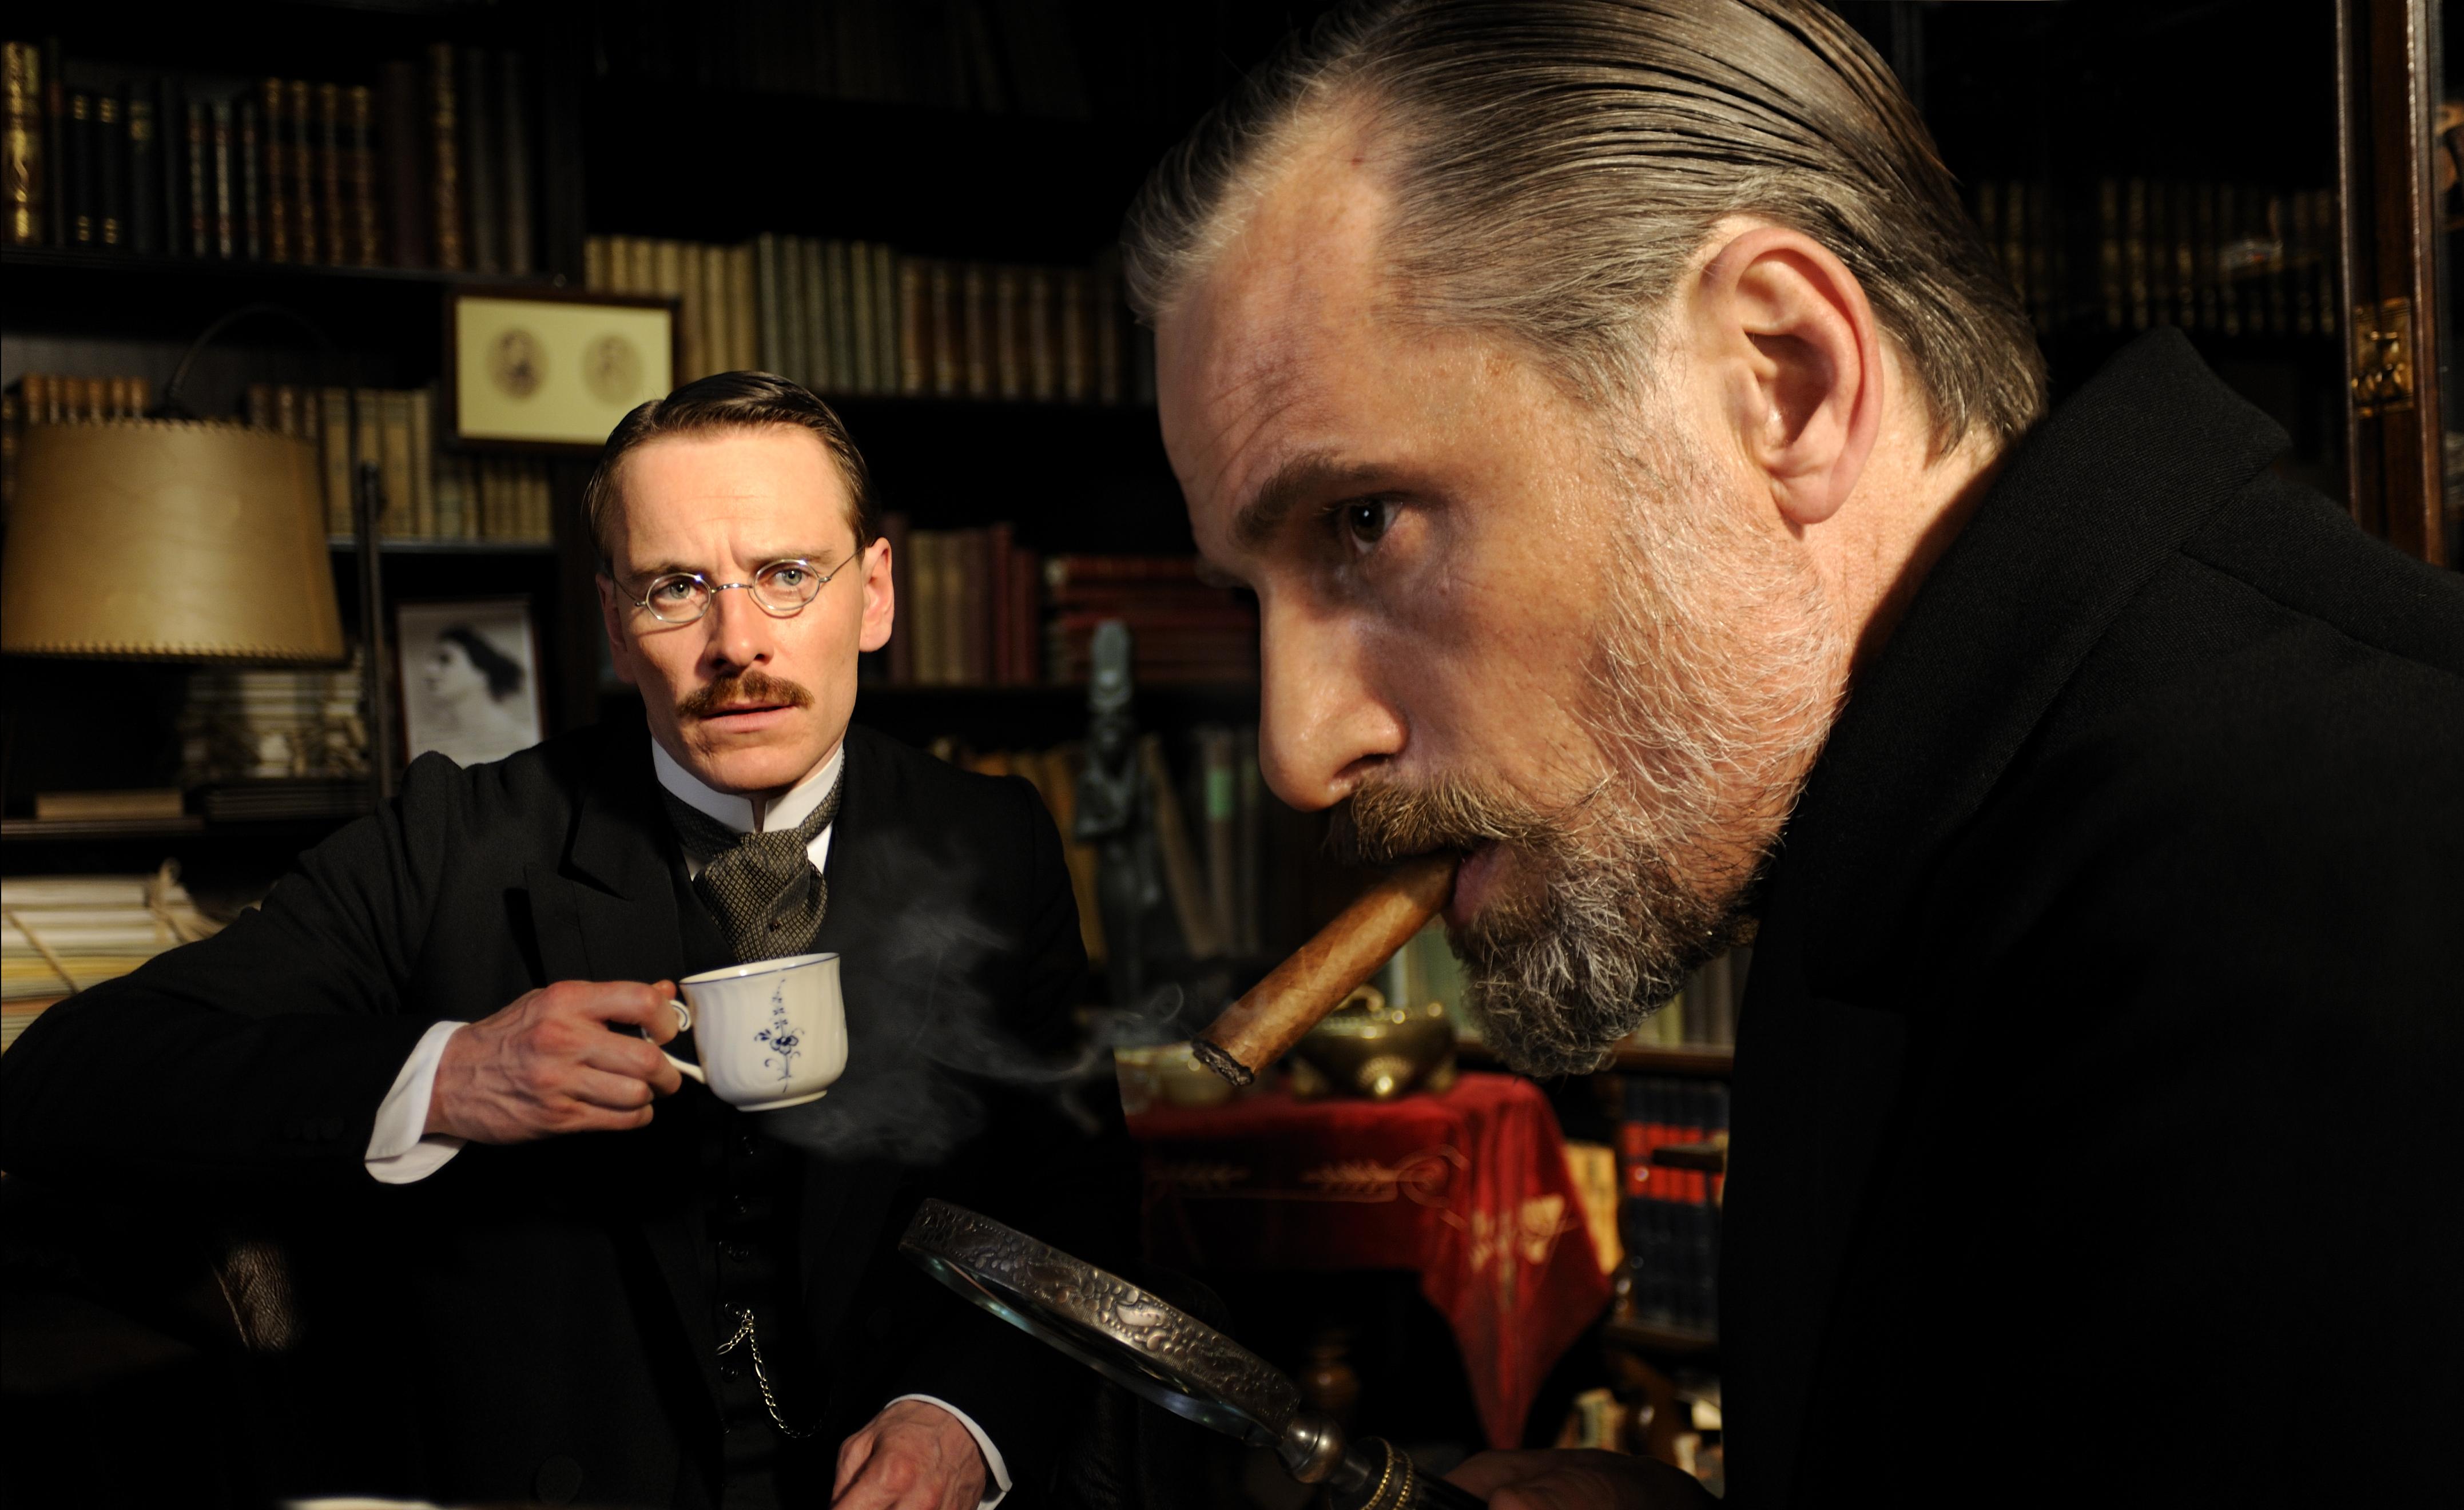 David Cronenberg Talks 'A Dangerous Method' - Flick Minute ... A Dangerous Method Freud